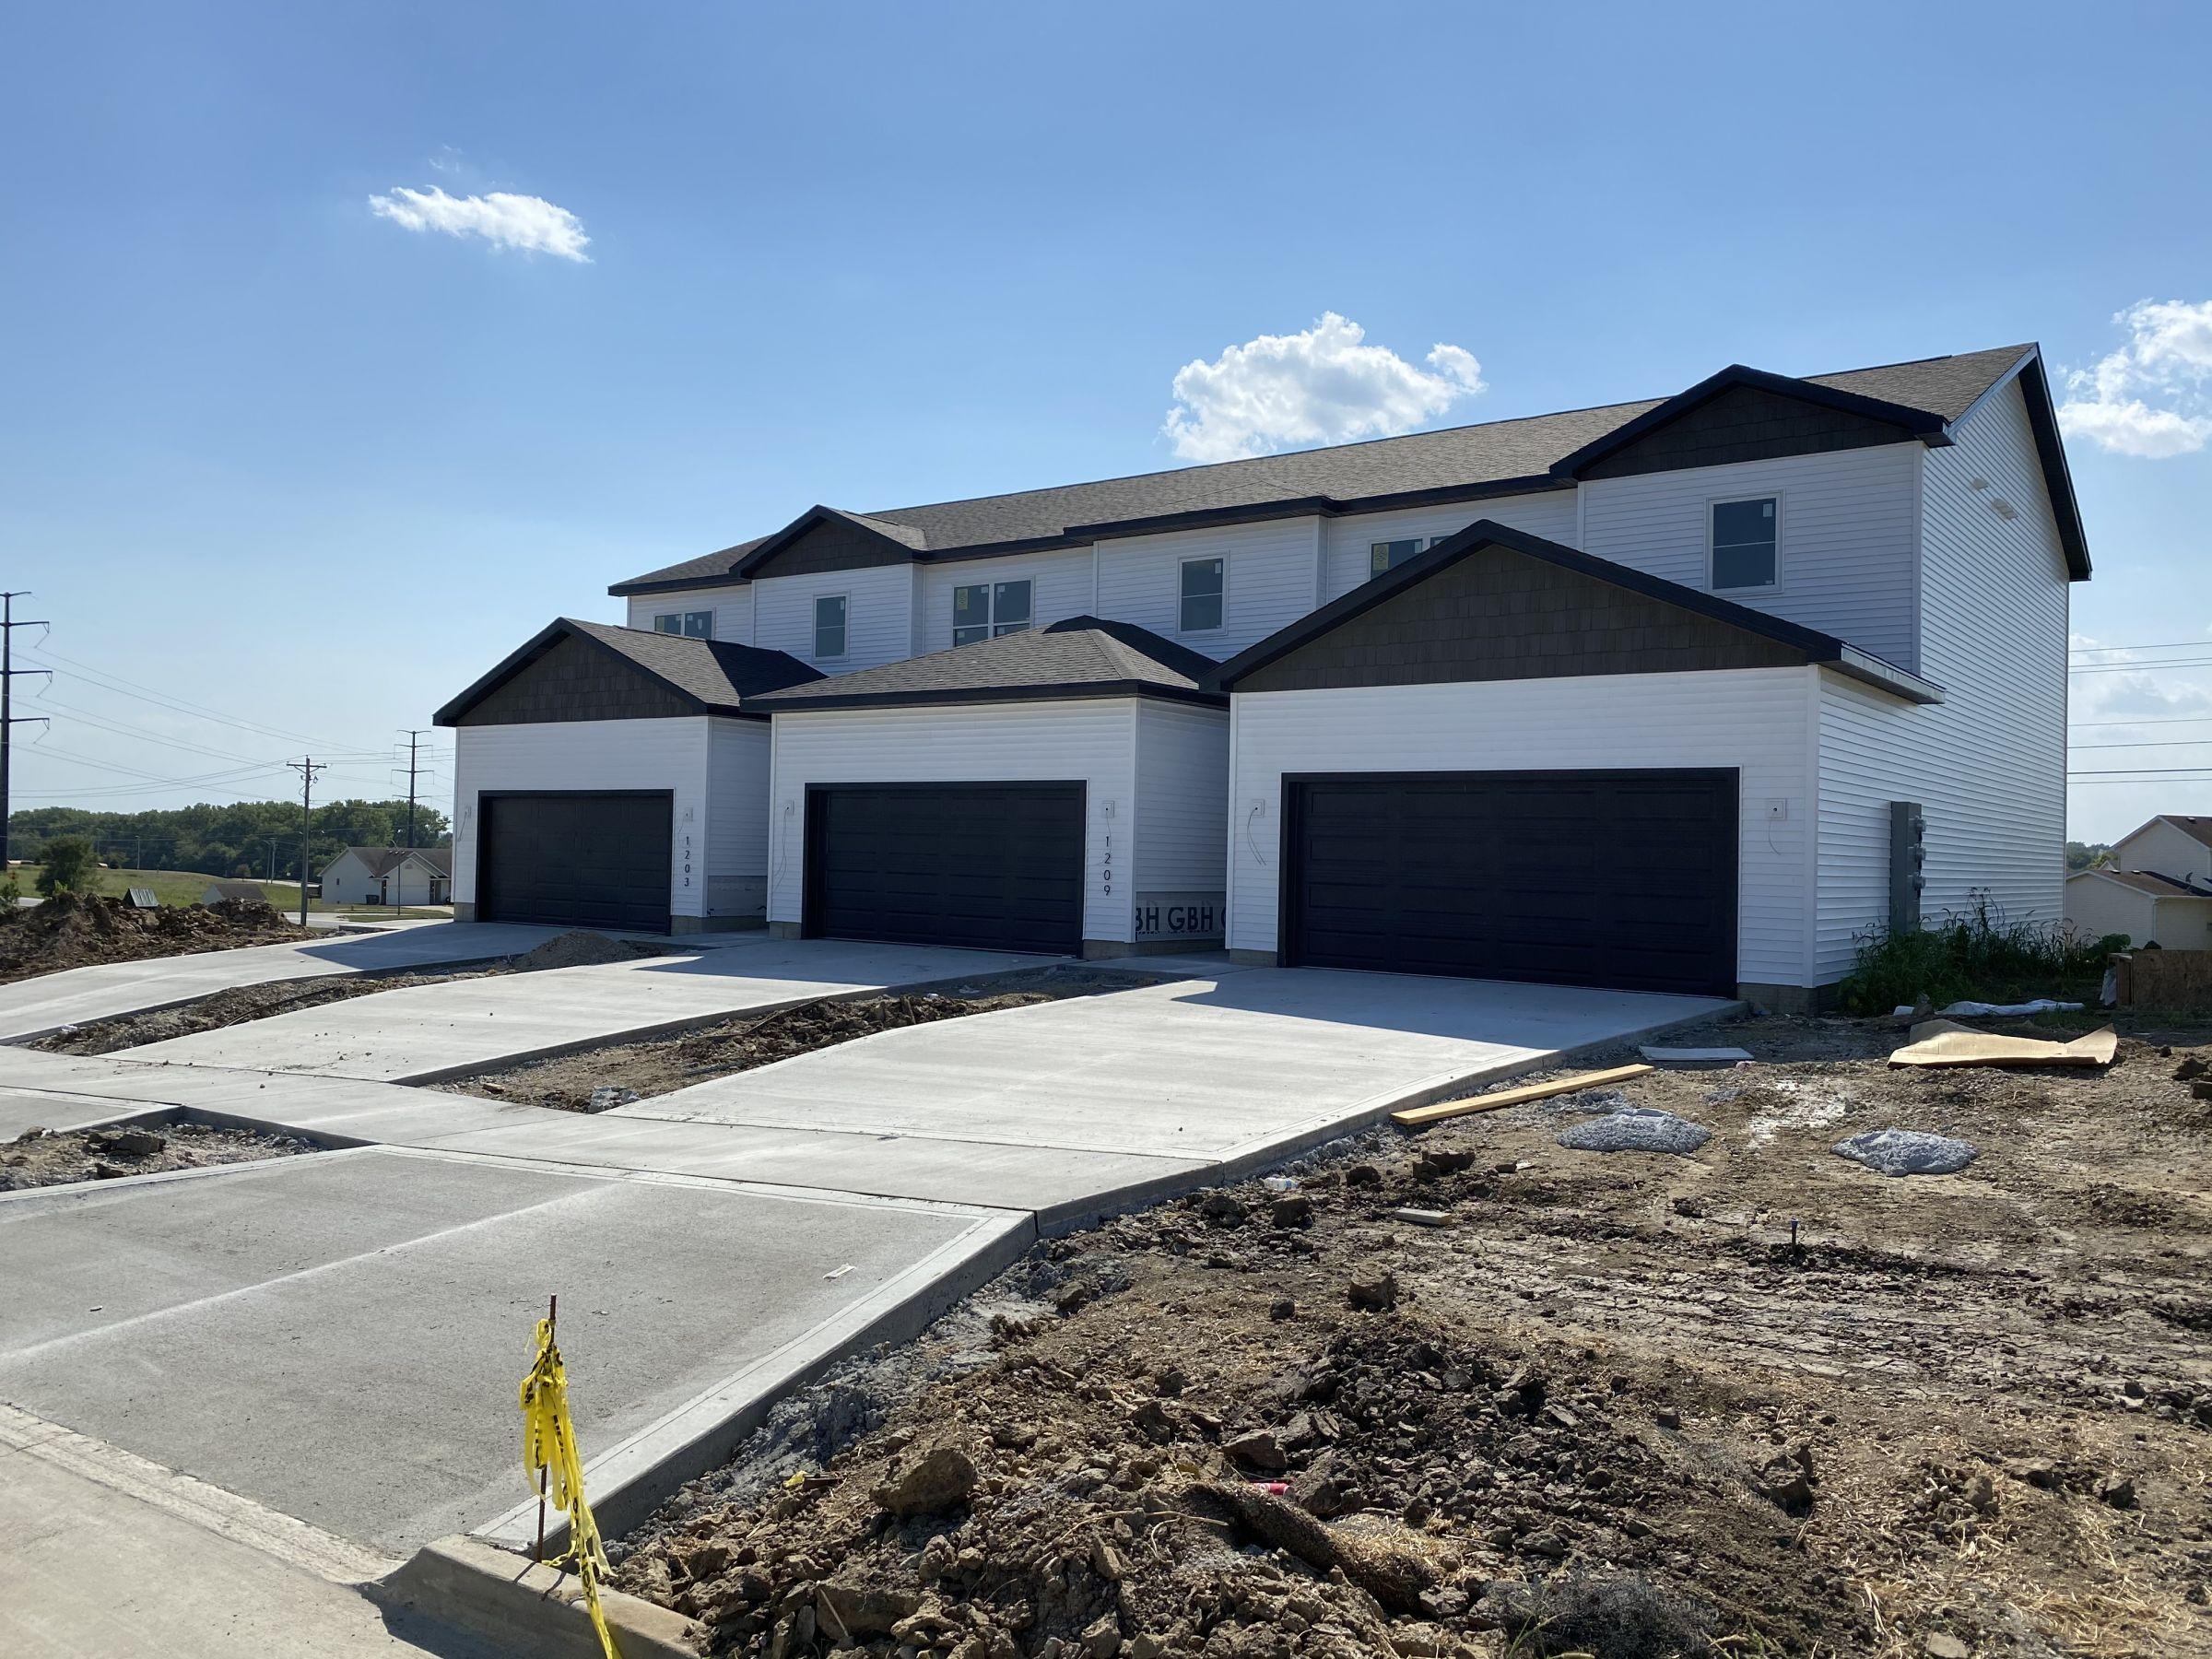 residential-warren-county-iowa-0-acres-listing-number-15134-1-2020-08-26-184913.jpg